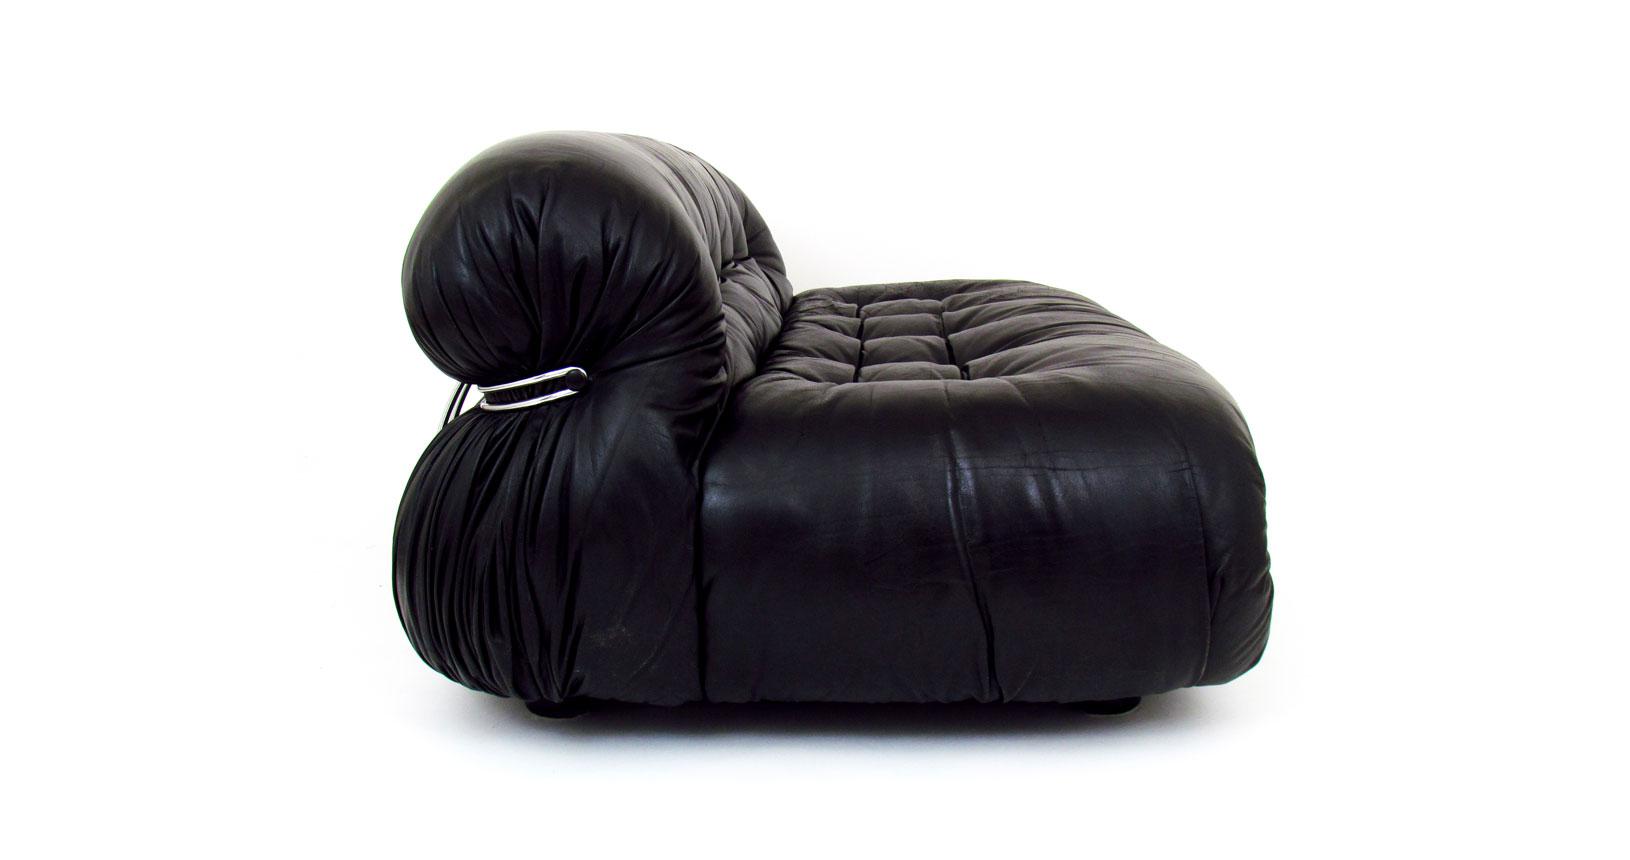 soriana sofa afra tobia scarpa divano pelle leather cassina vintage design